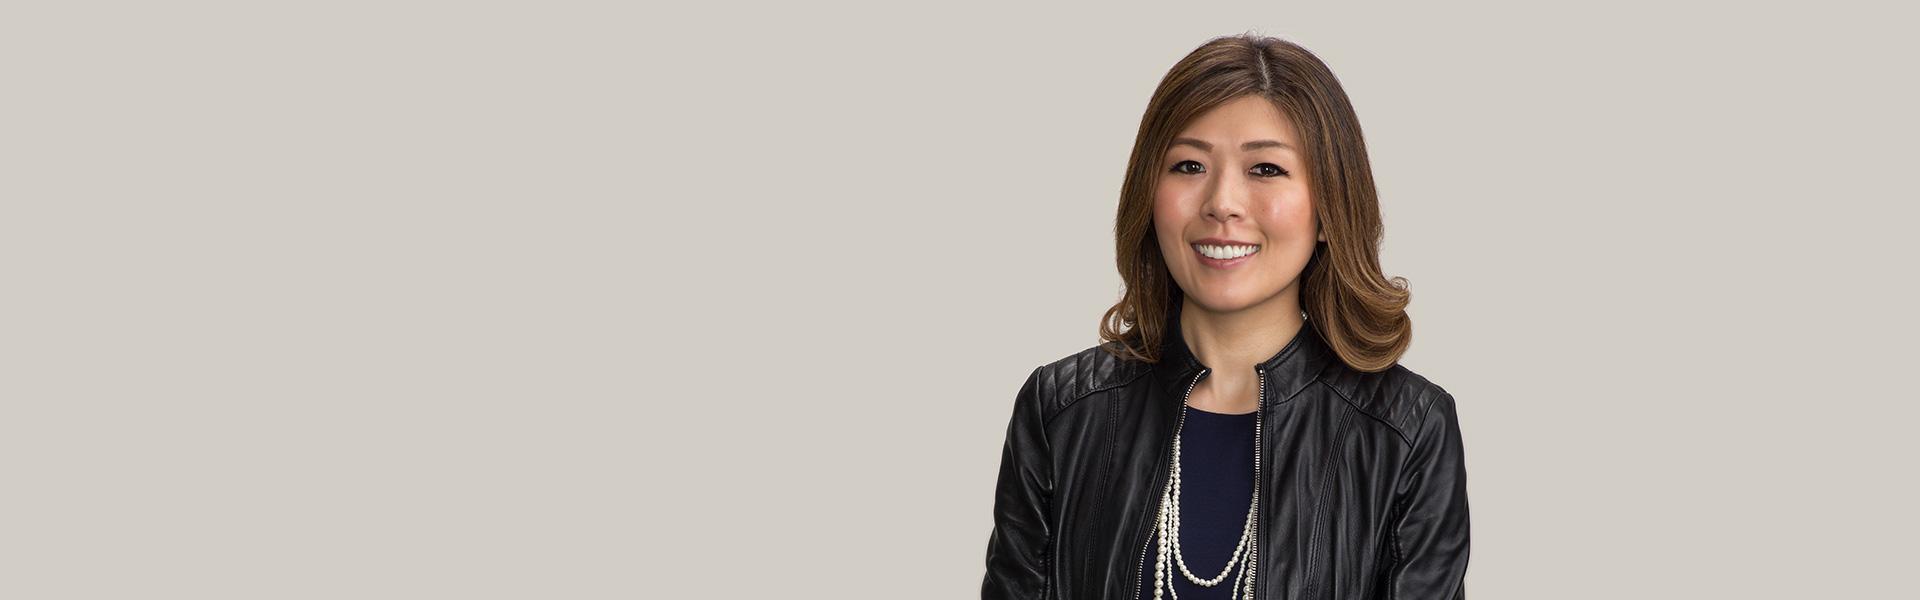 Mayu Dietrich of Microsoft